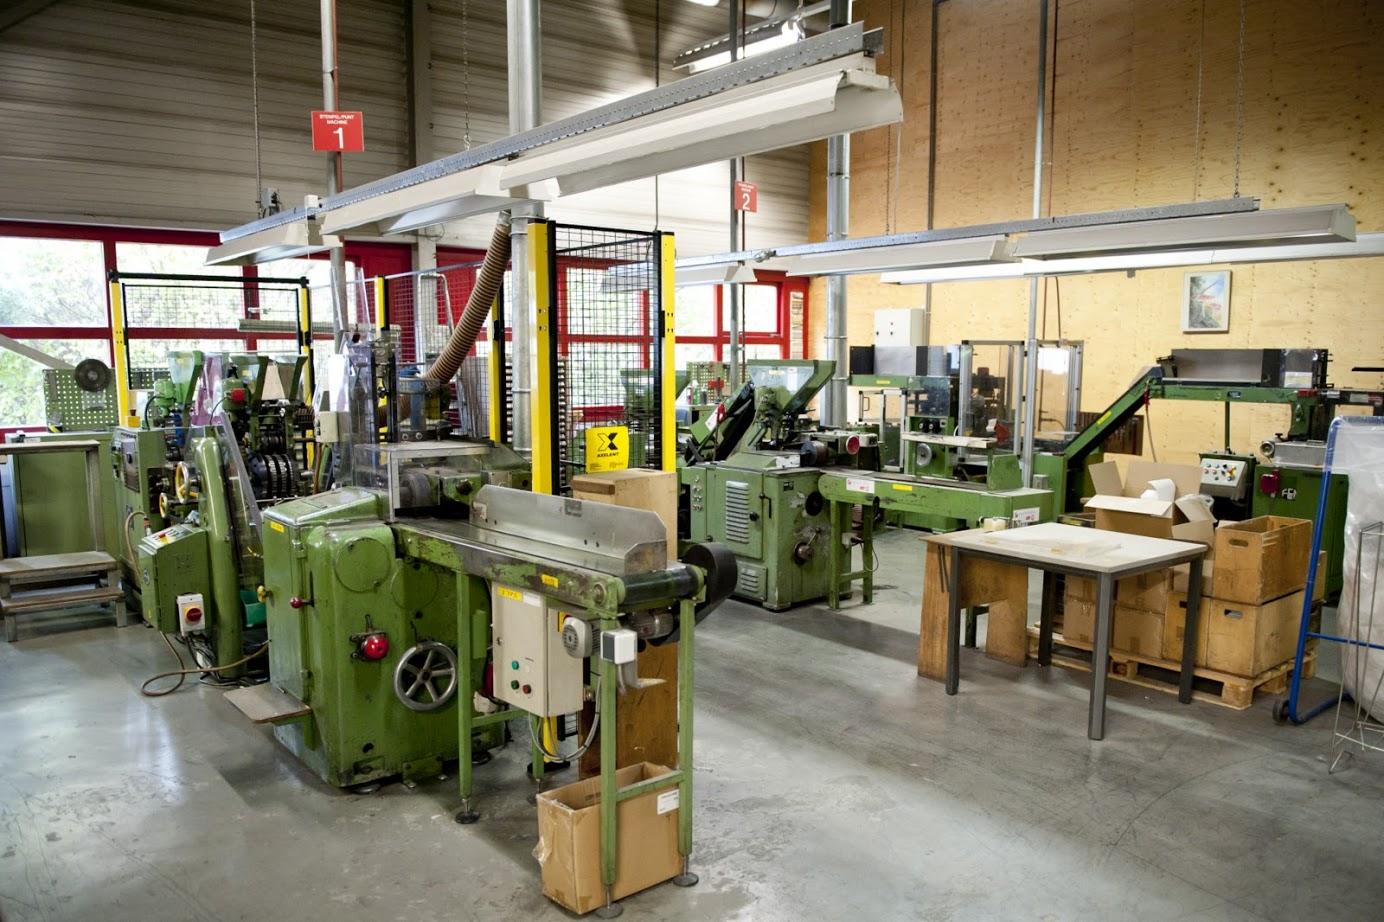 Werkplaats Bruynzeel